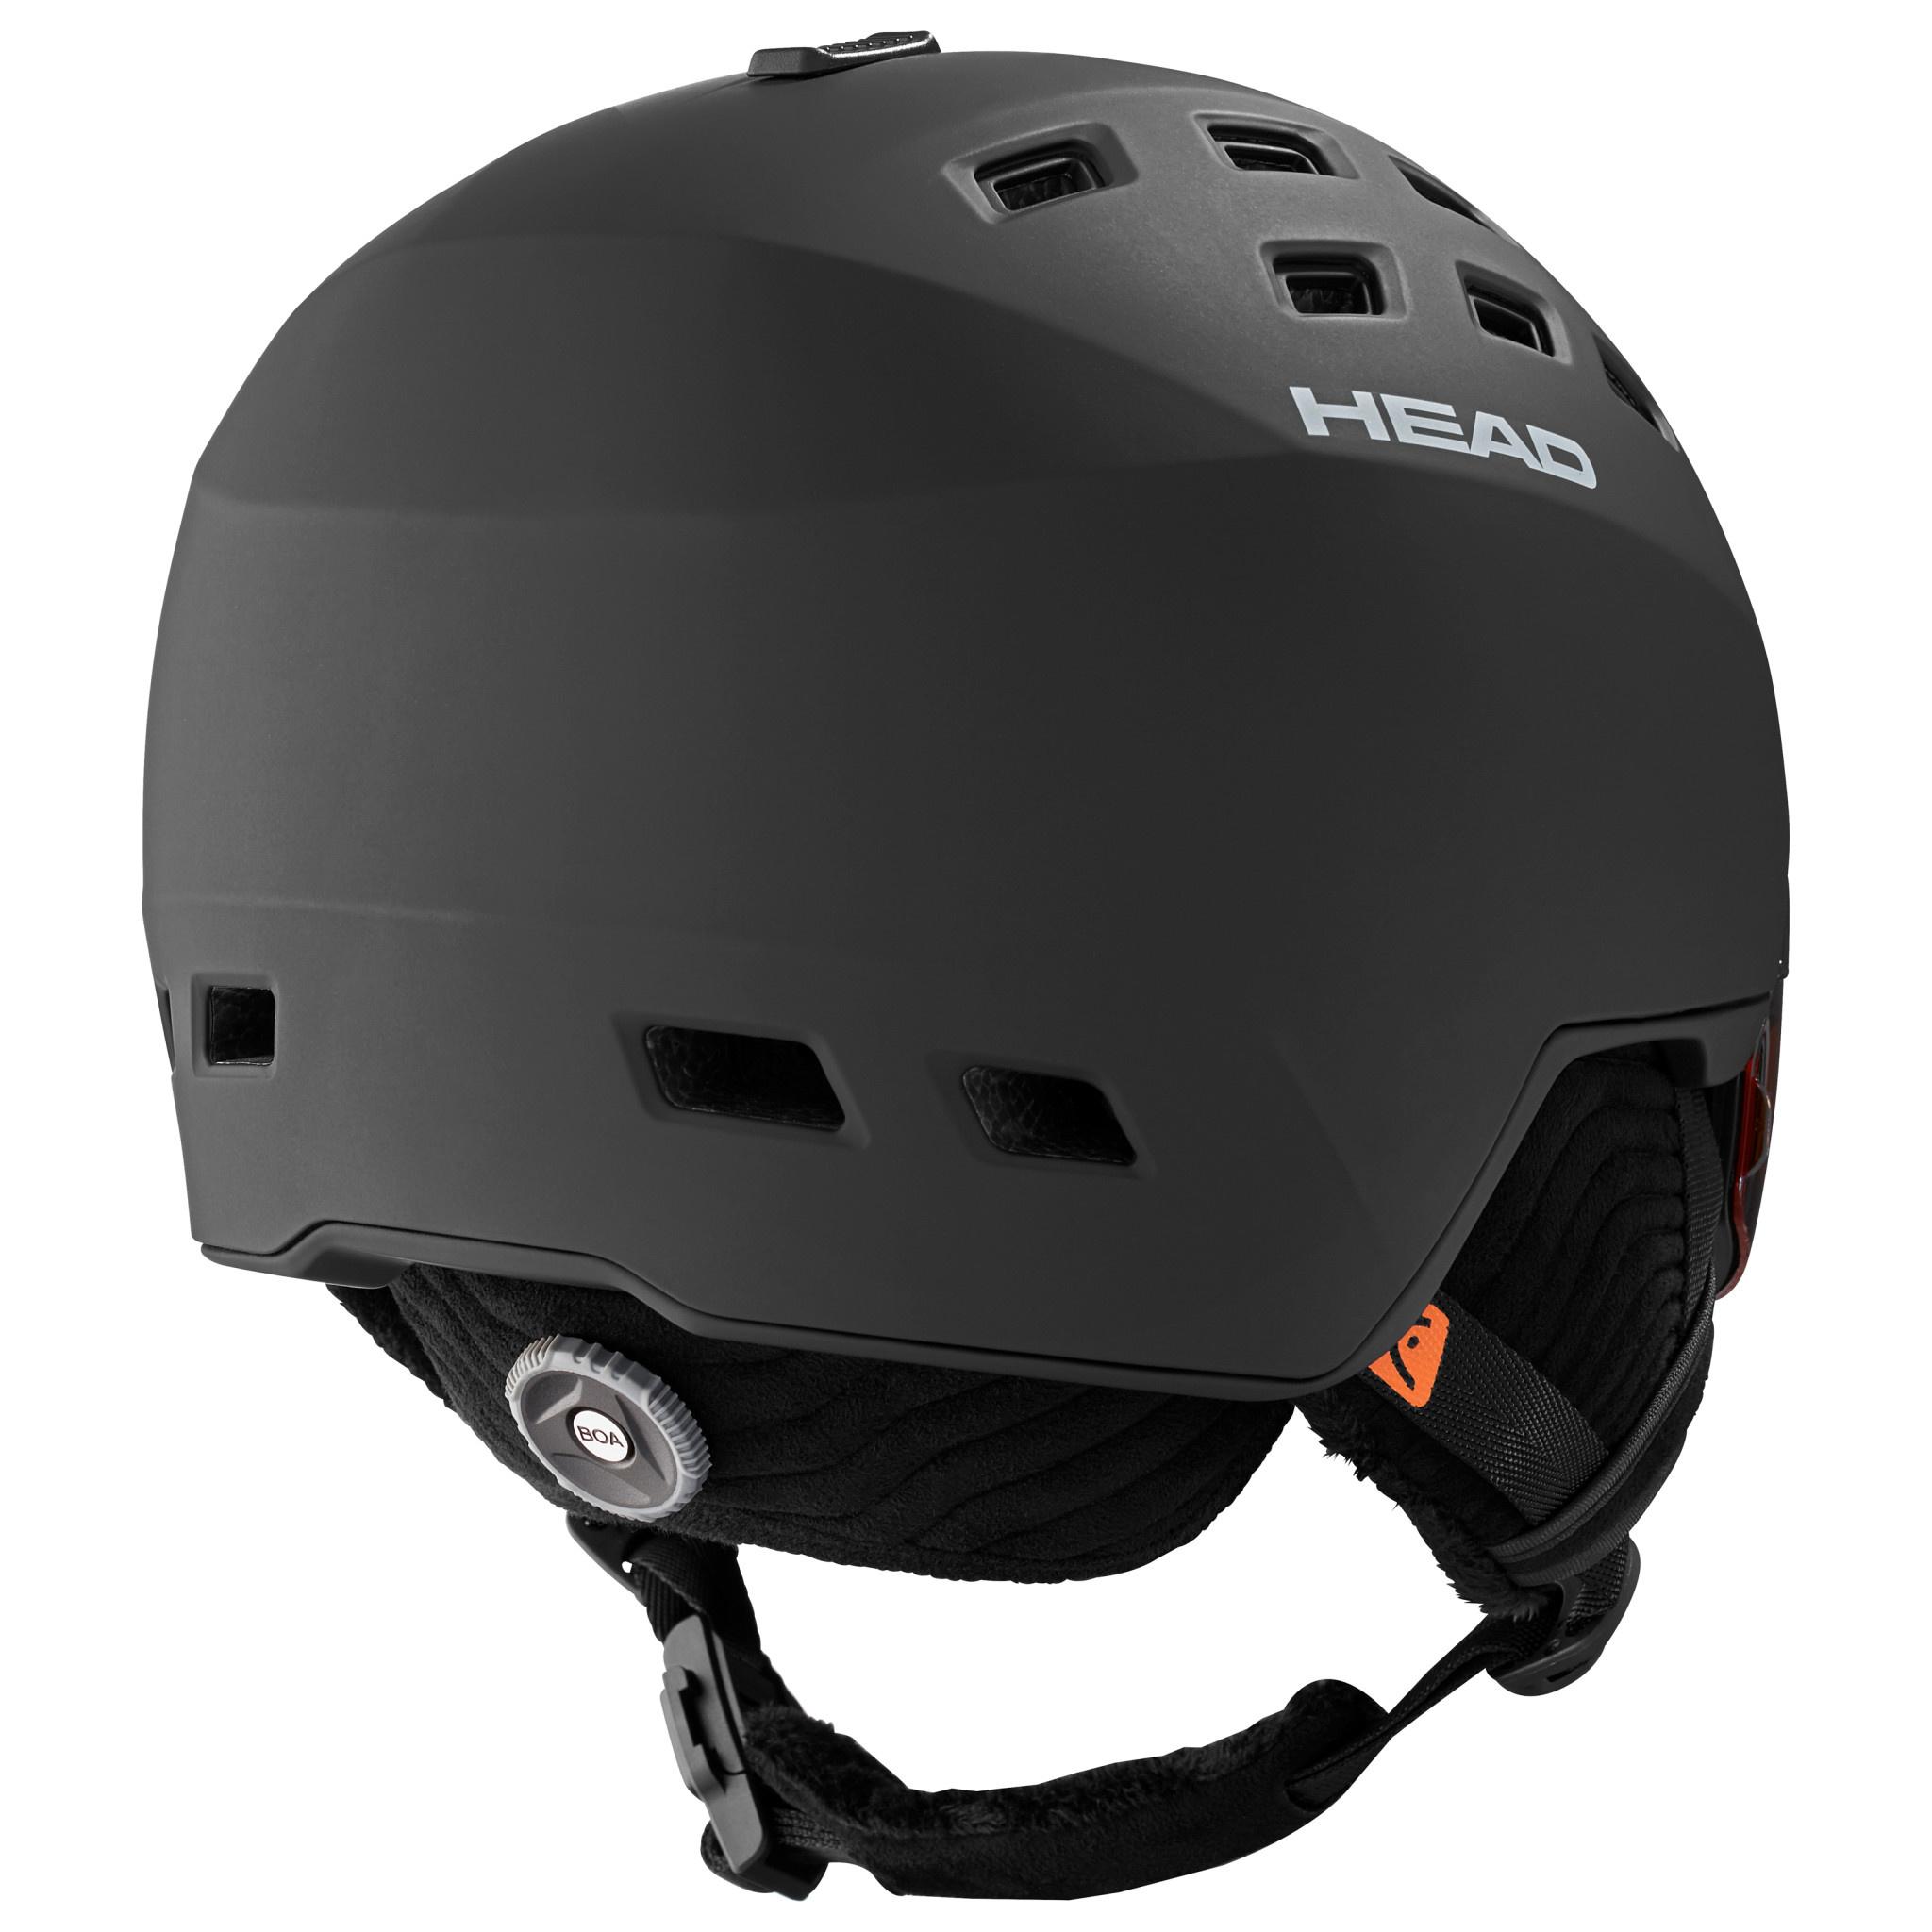 Head Head Radar MIPS Snow Helmet